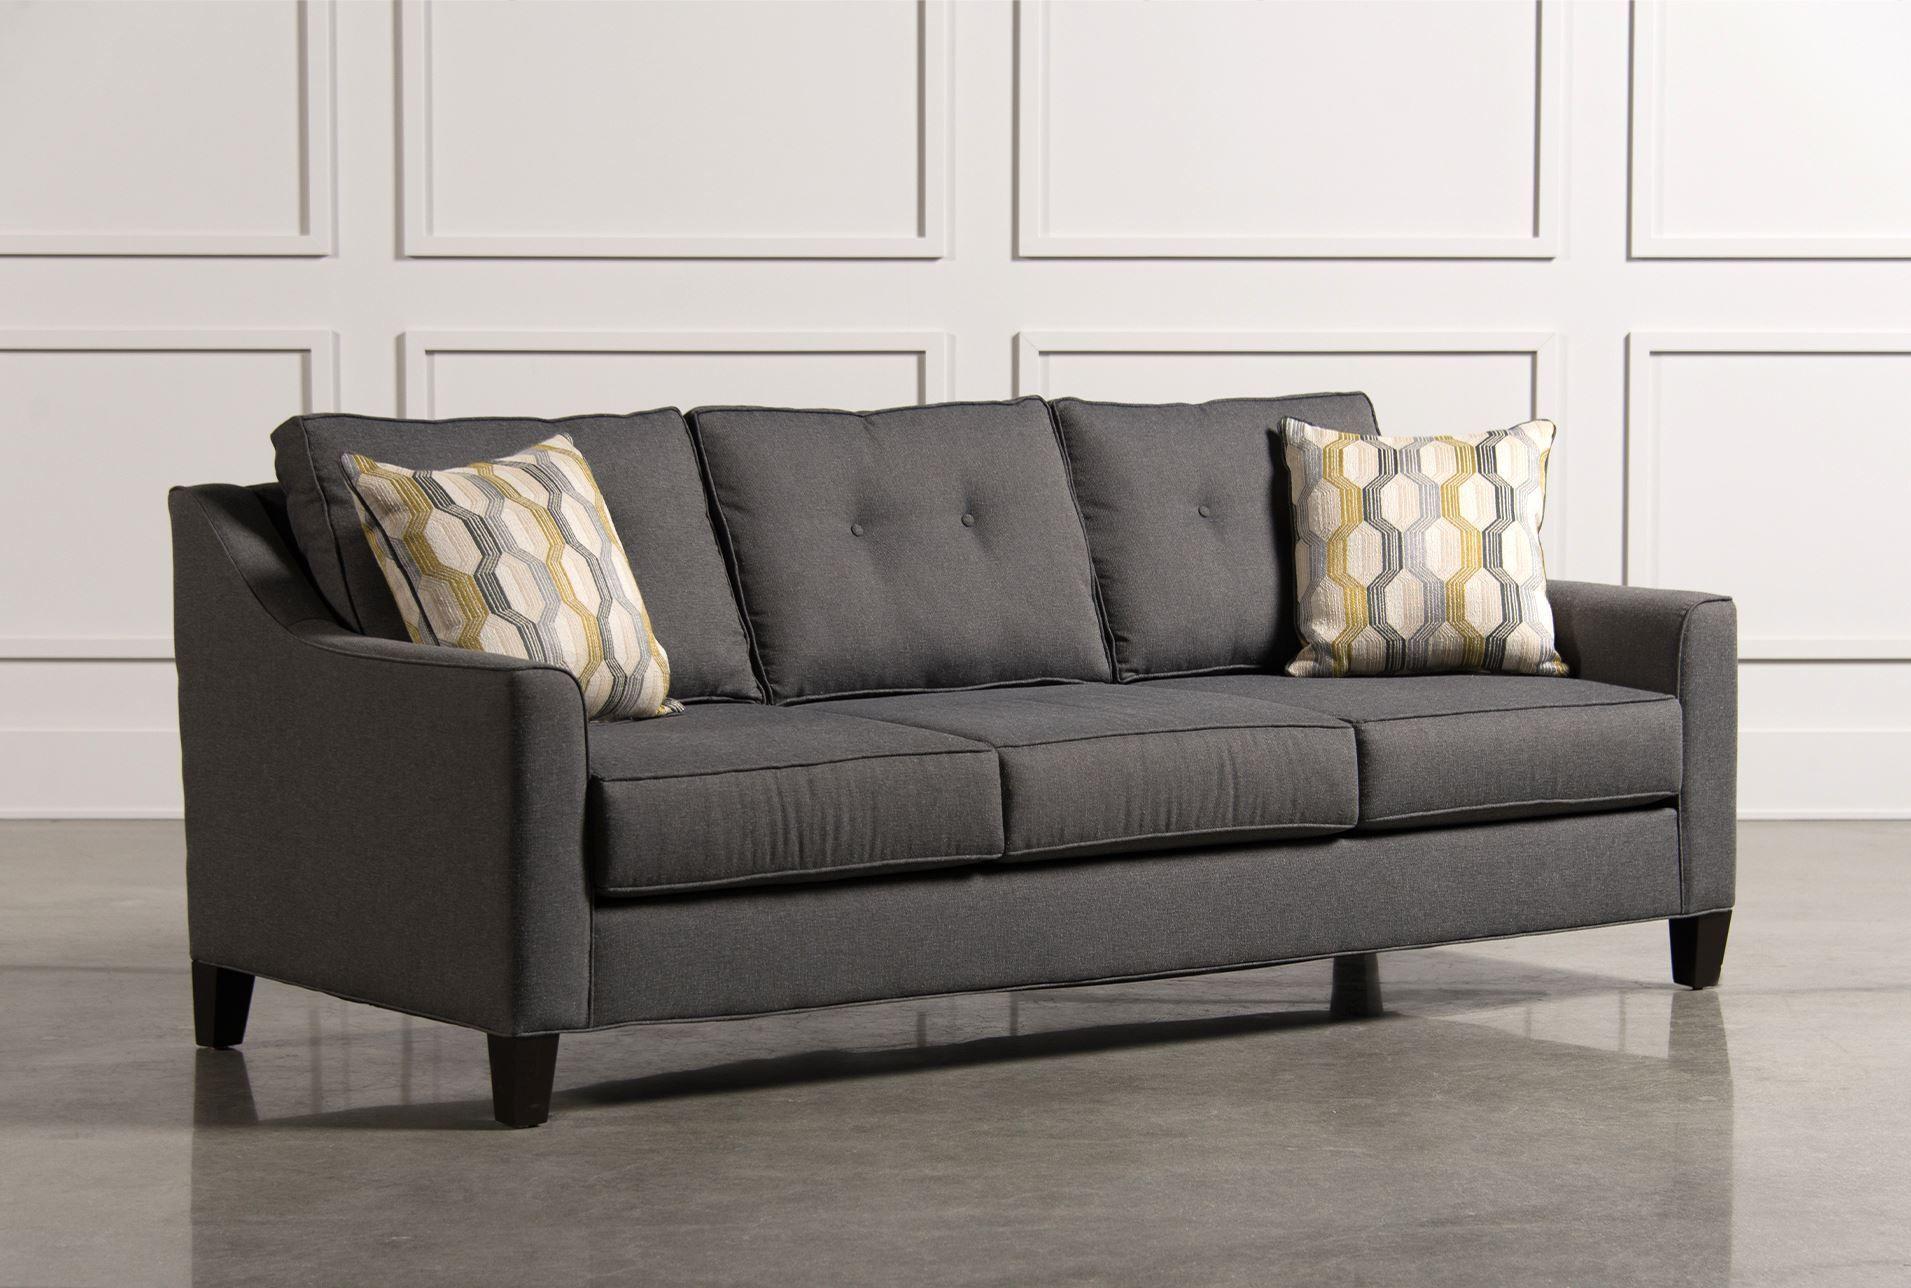 695 90wx 41 d great reviews Marsden Sofa Signature 3rd